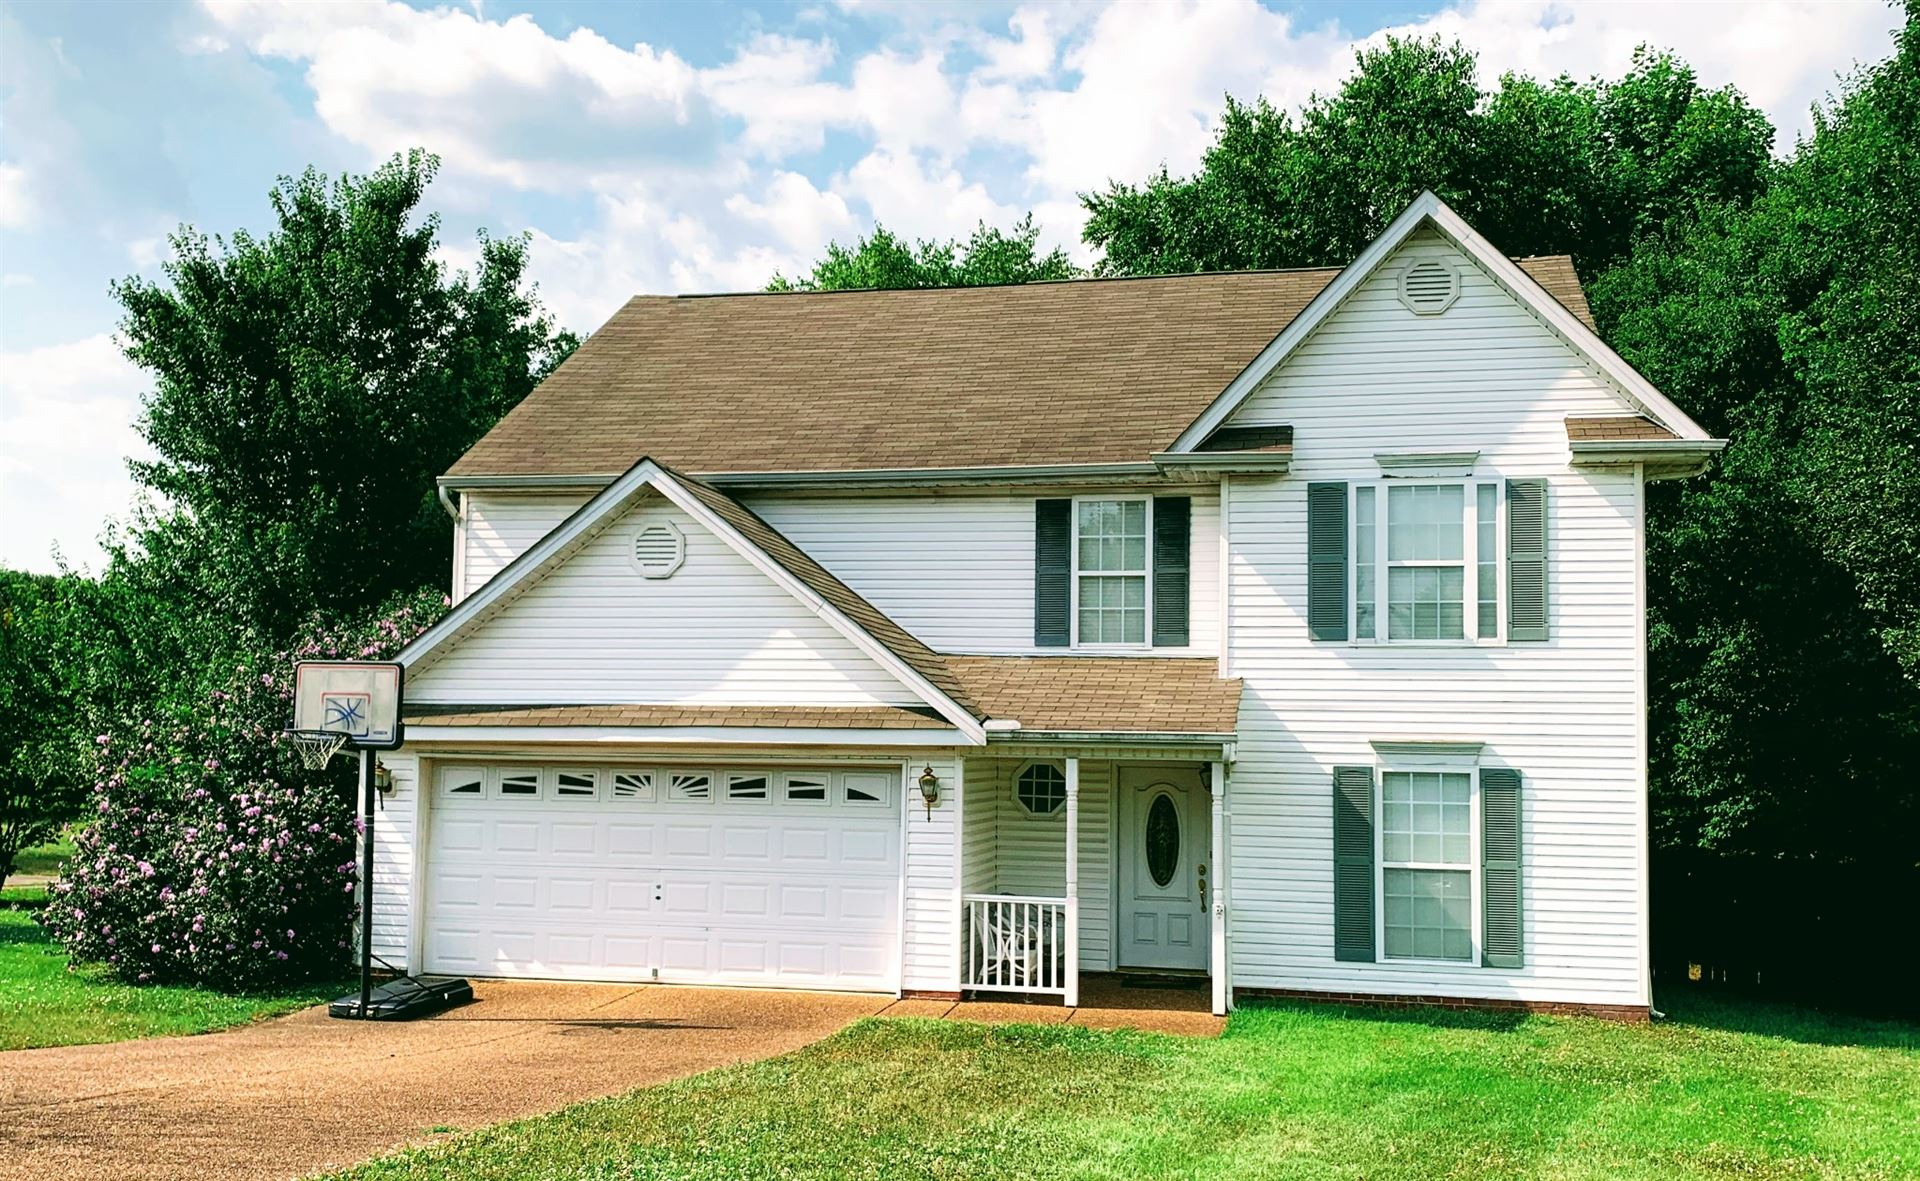 Photo of 2260 Hayward Ln, Spring Hill, TN 37174 (MLS # 2269416)